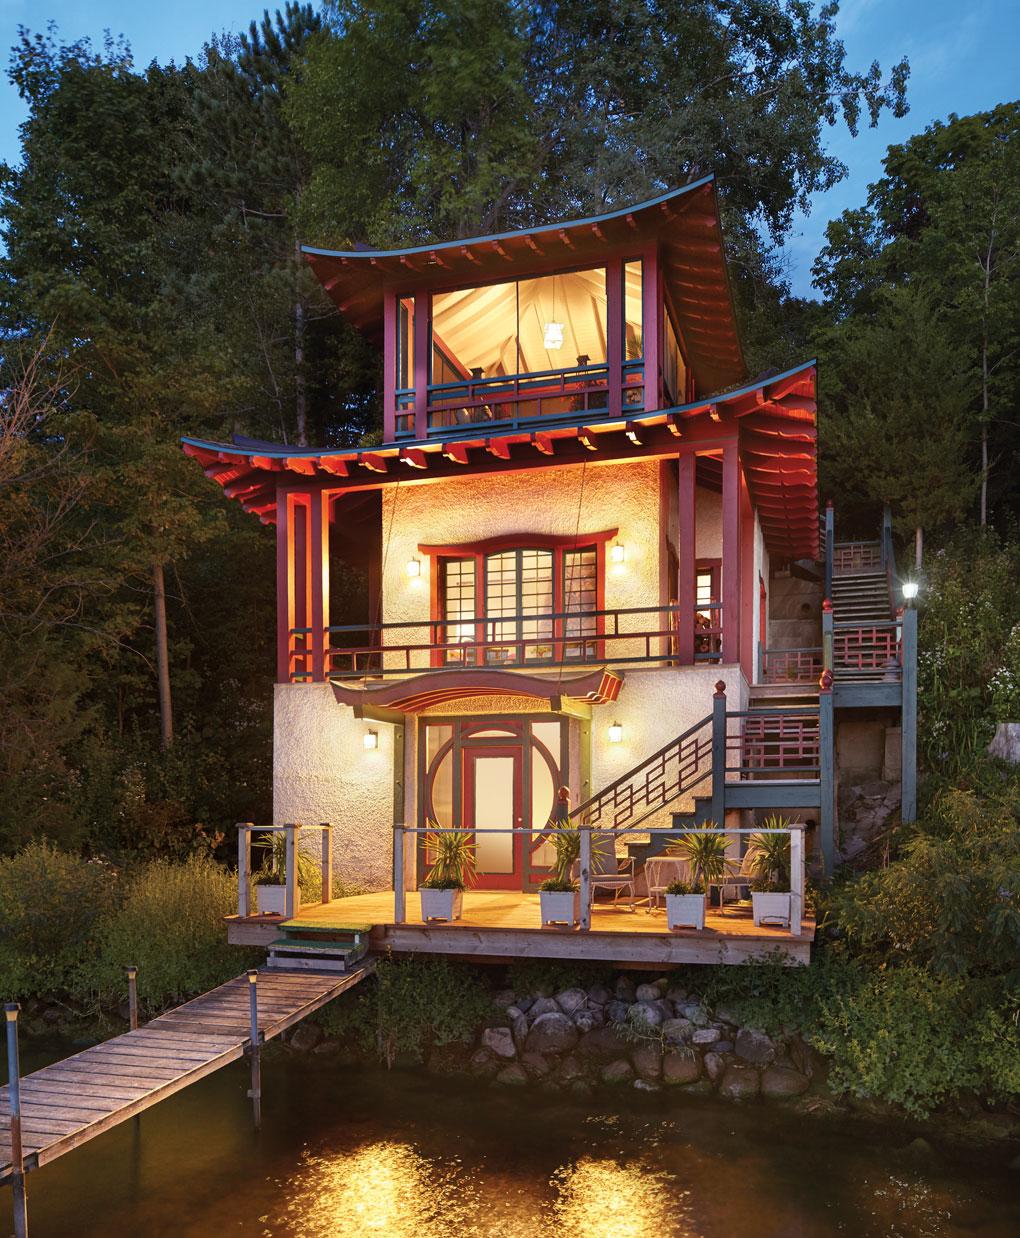 The Robbins-Scott Boathouse on Lake Minnetonka.